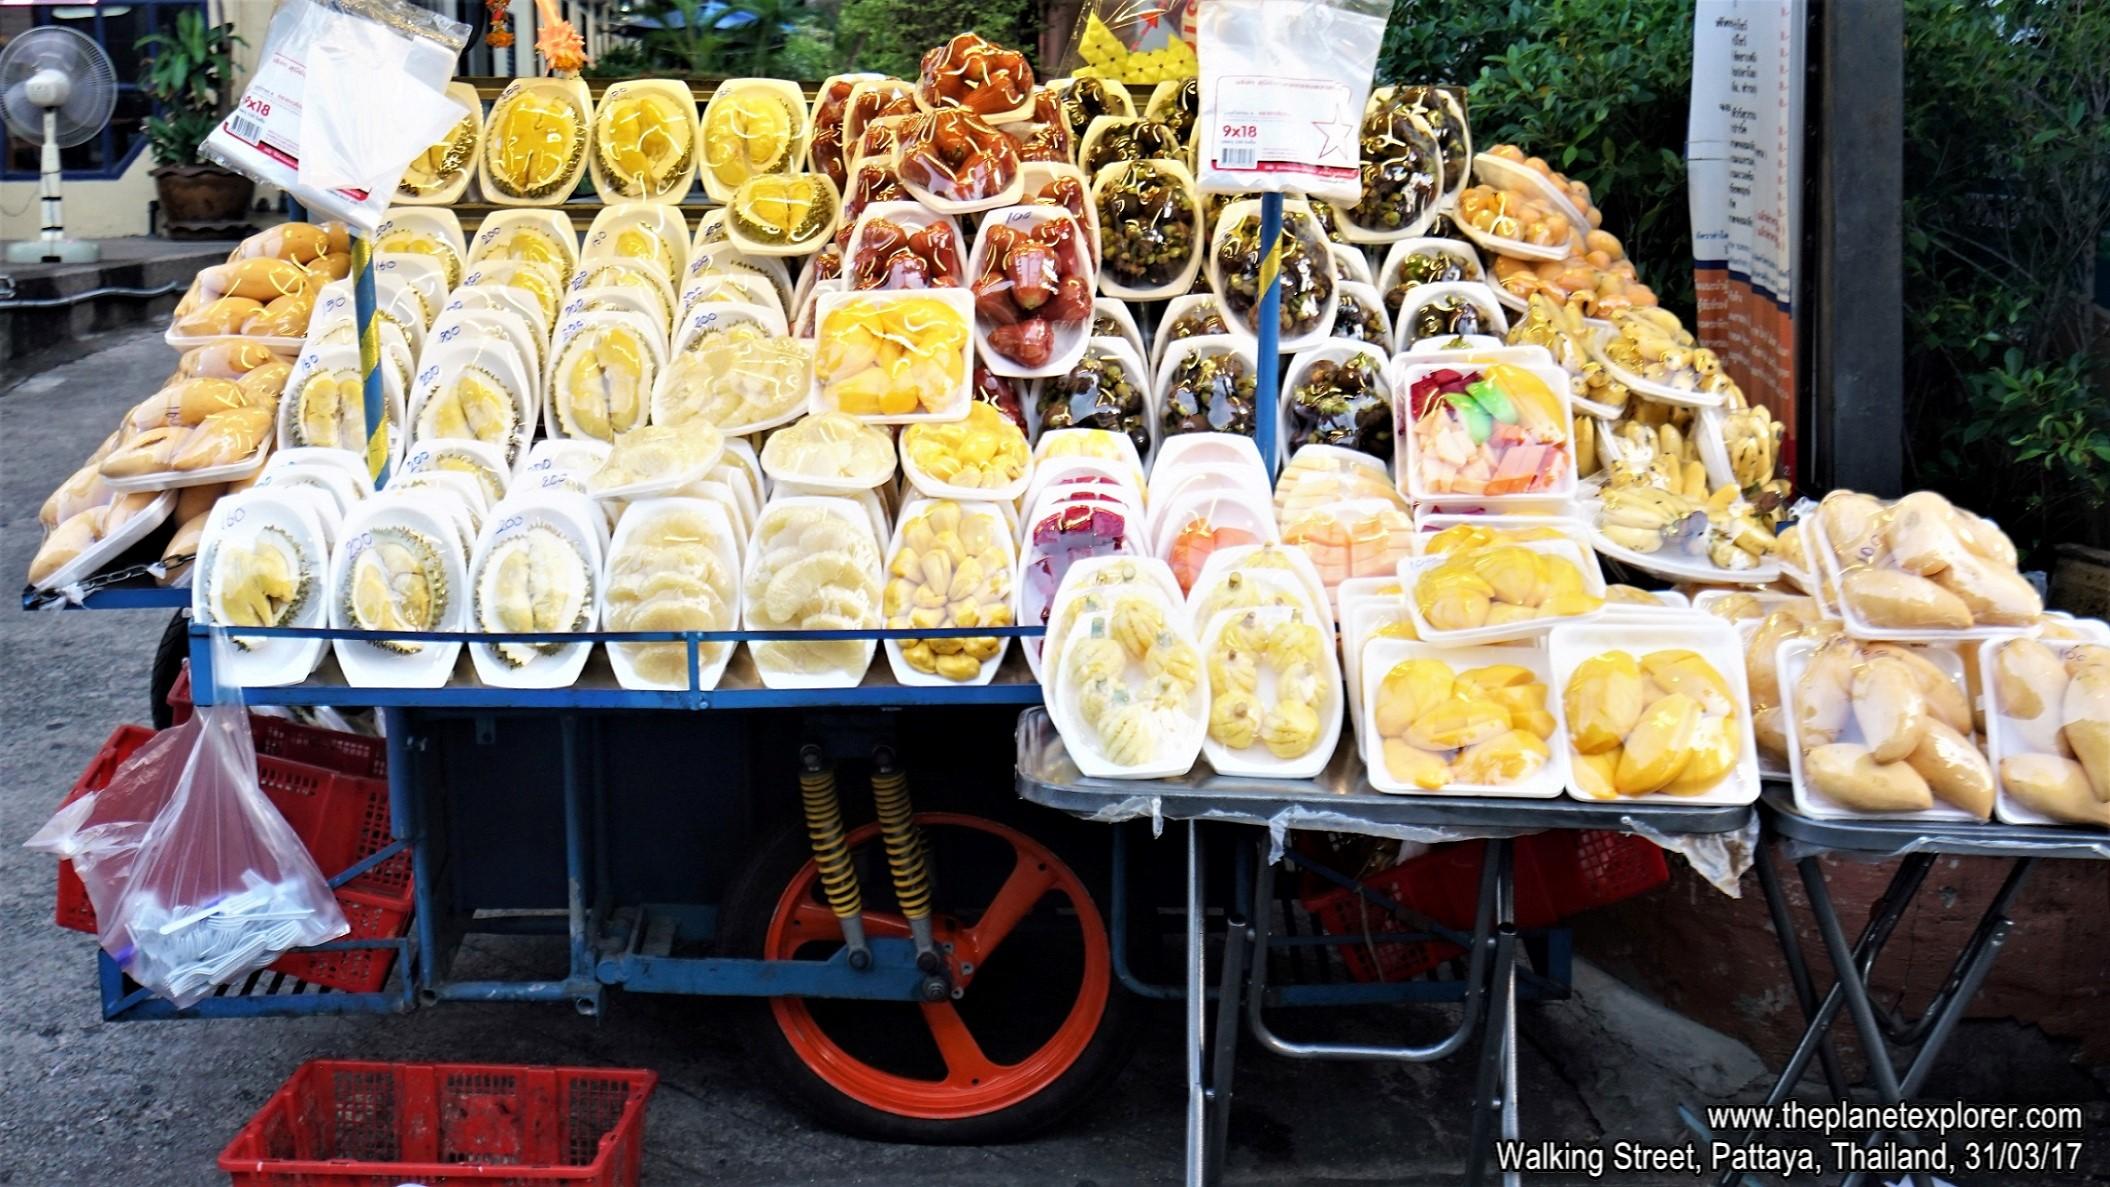 2017-03-31_1944_Thailand_Pattaya_Walking Street_DSC04015_s7R2_LR_@